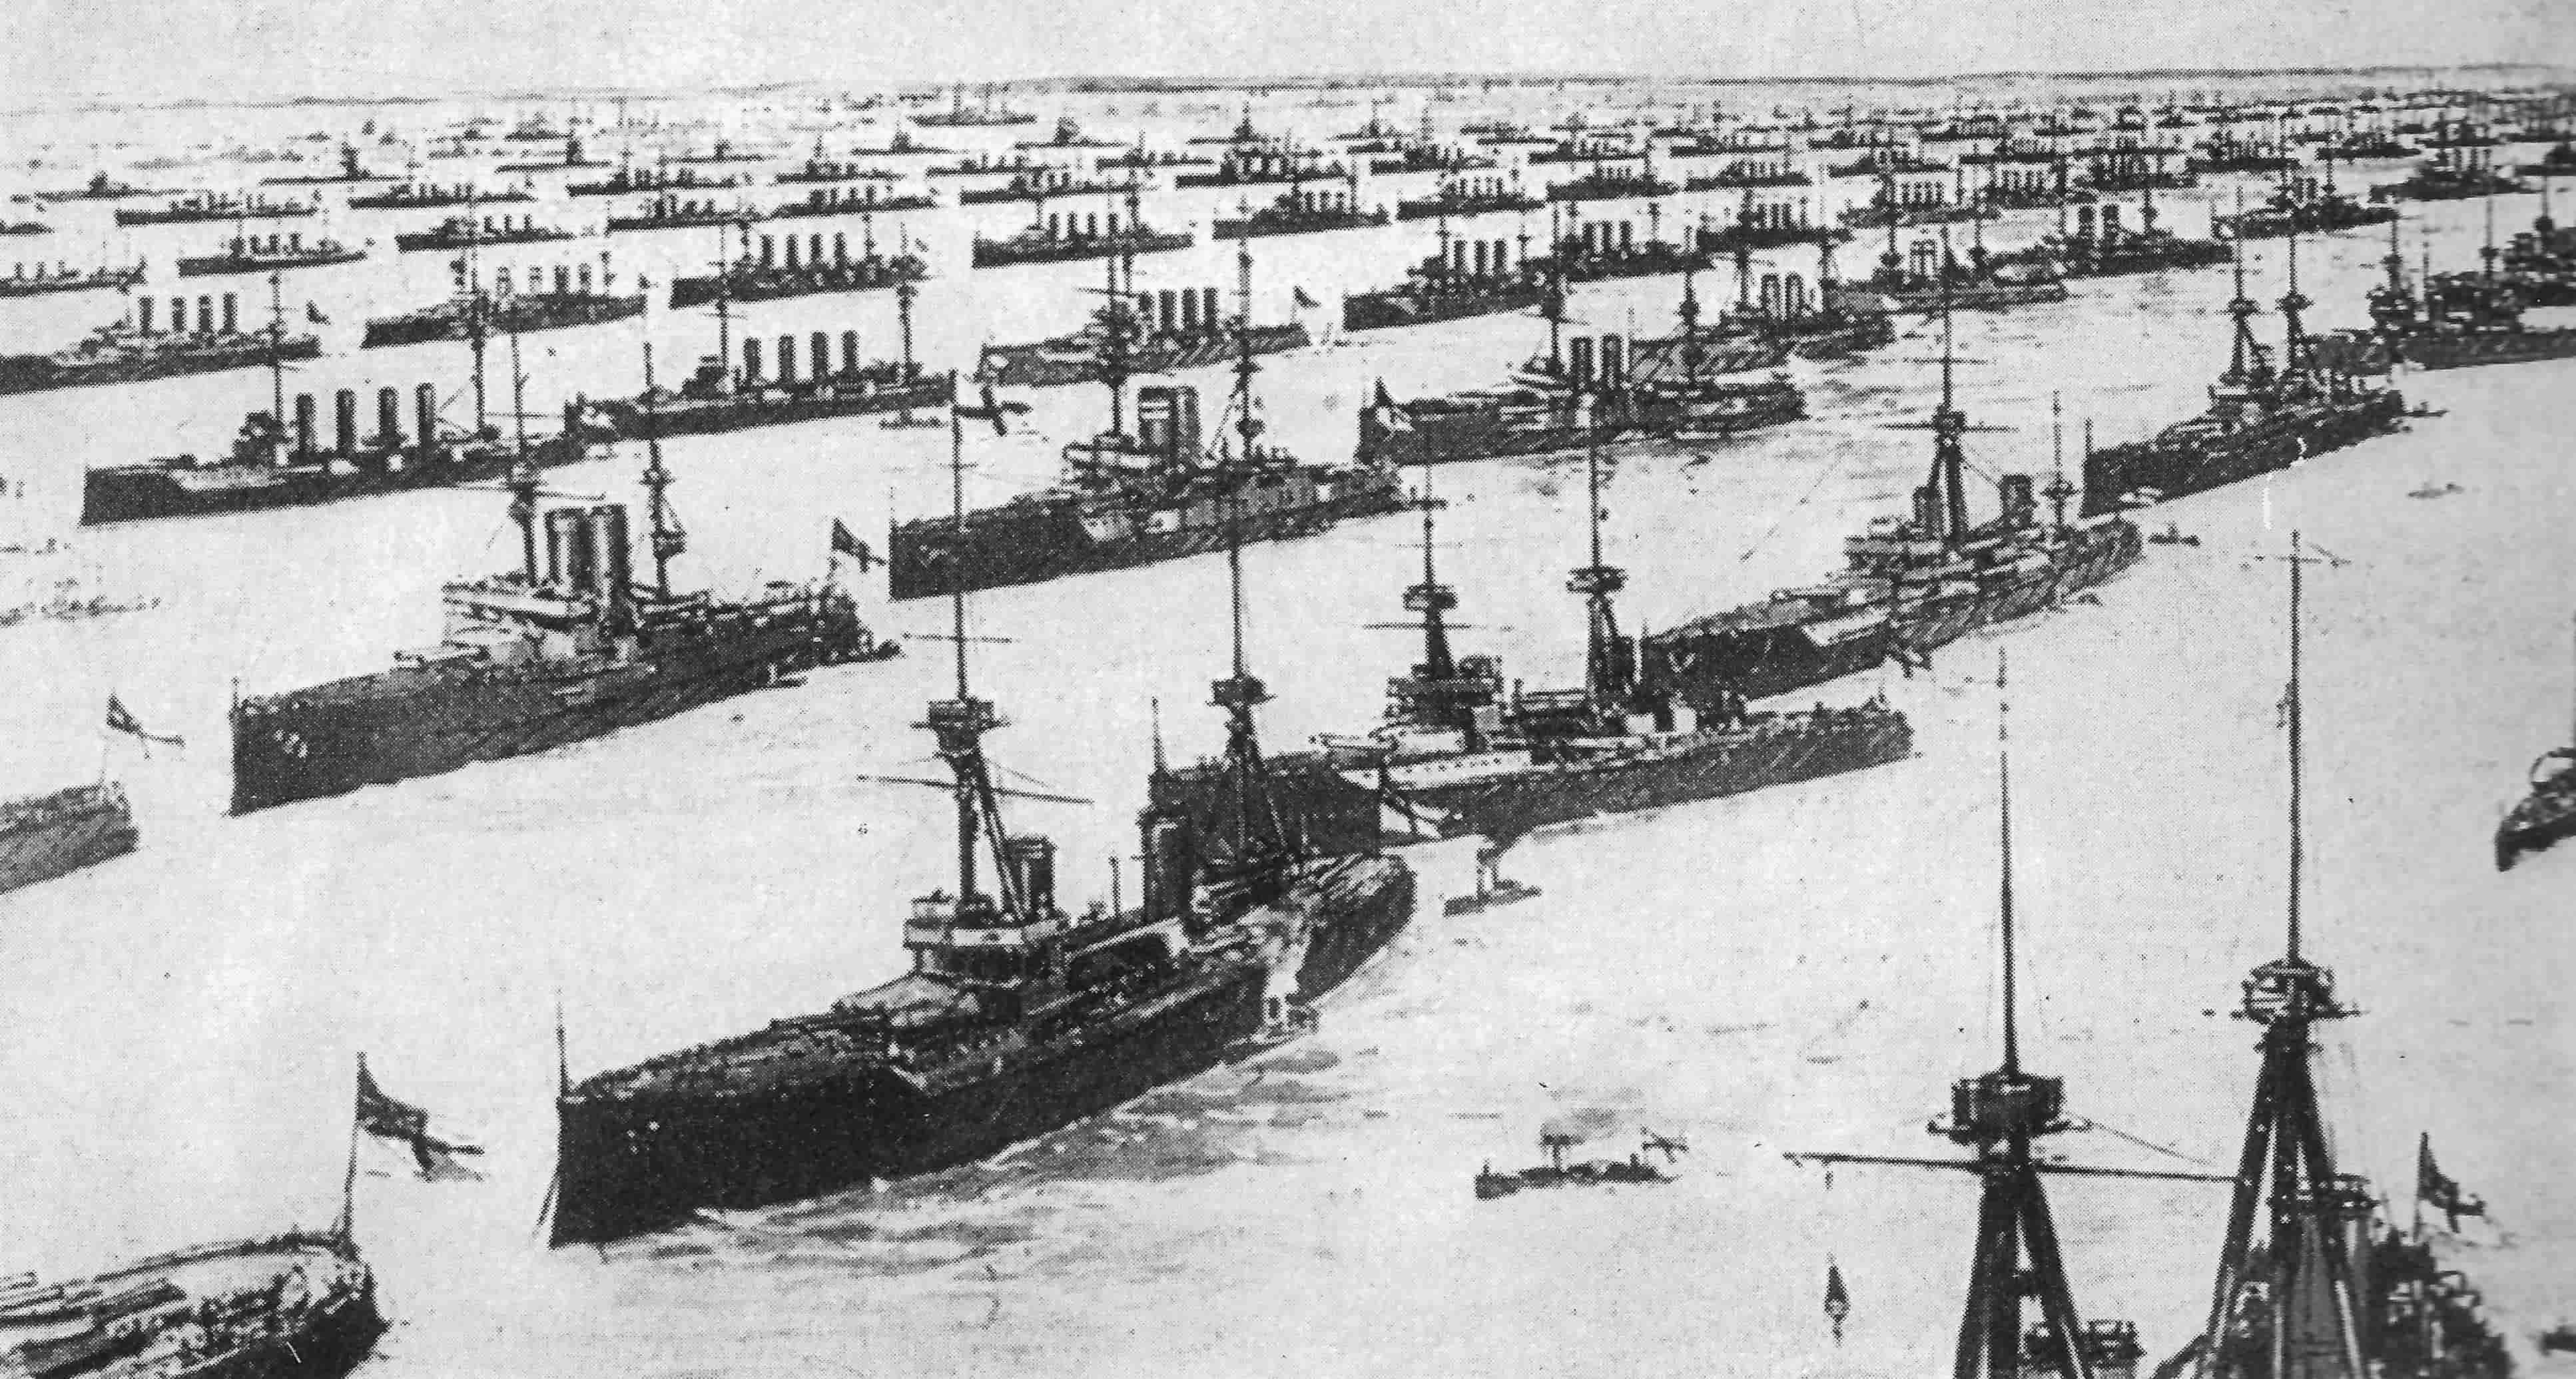 1911-06-14 Flottenparade Spithead-min